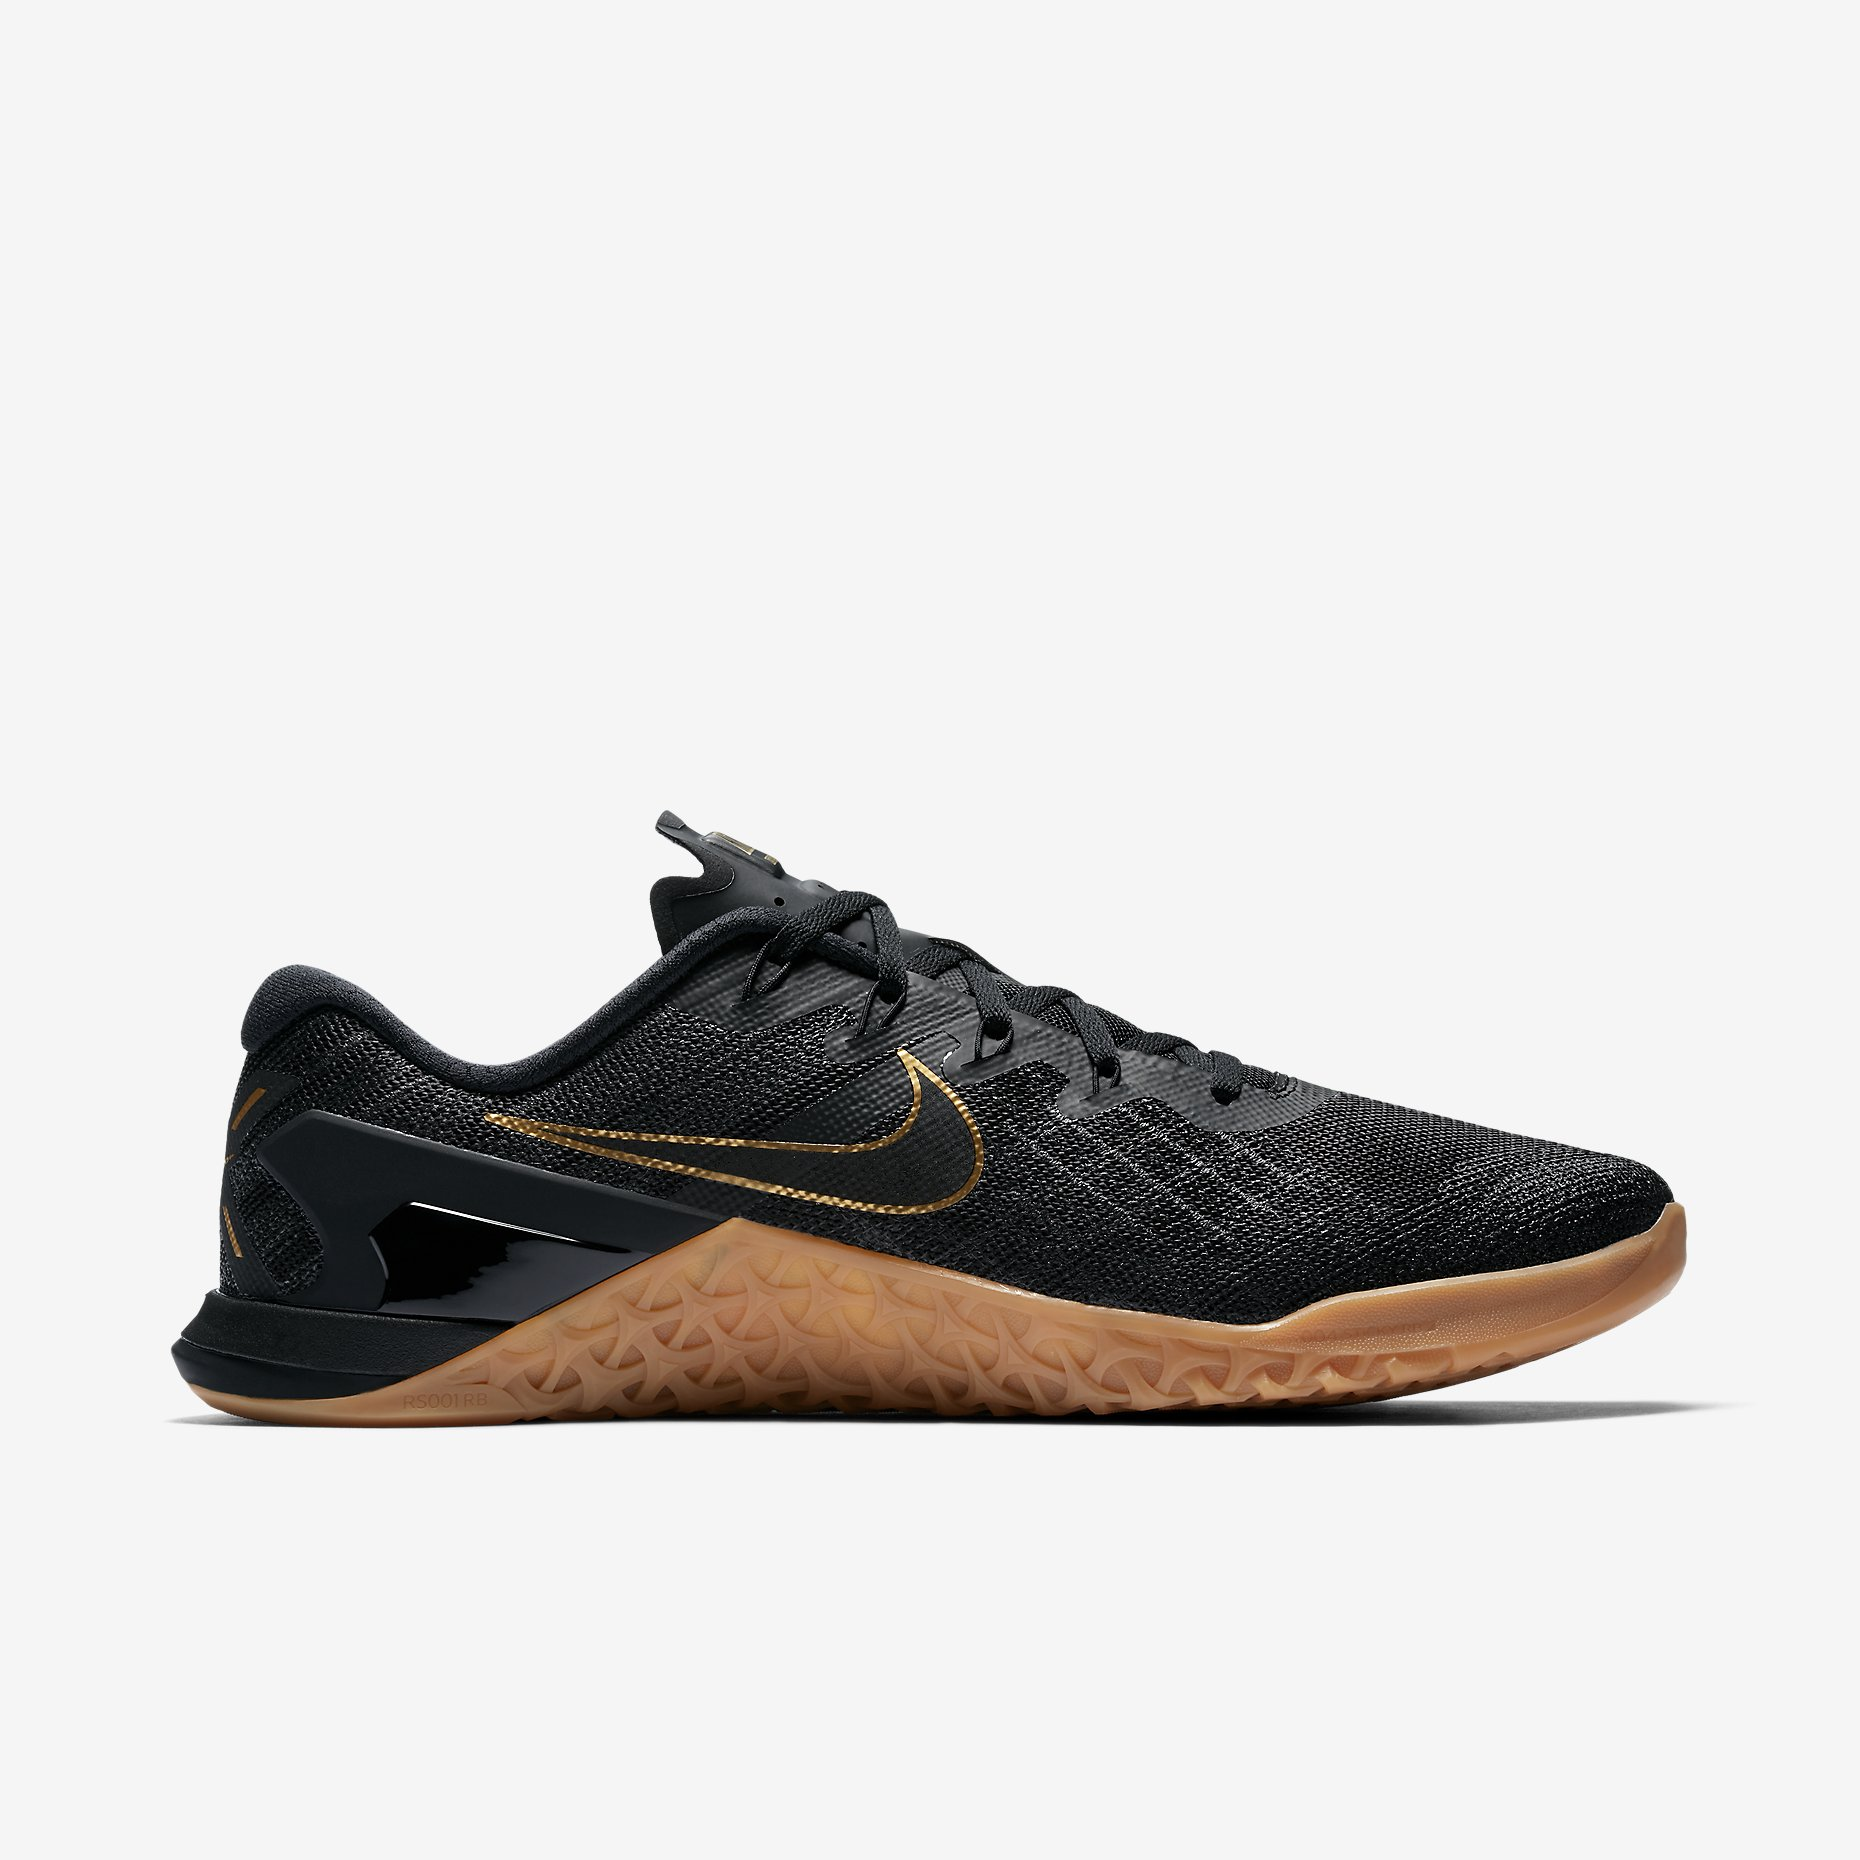 metcon-3-x-mens-training-shoe (2)